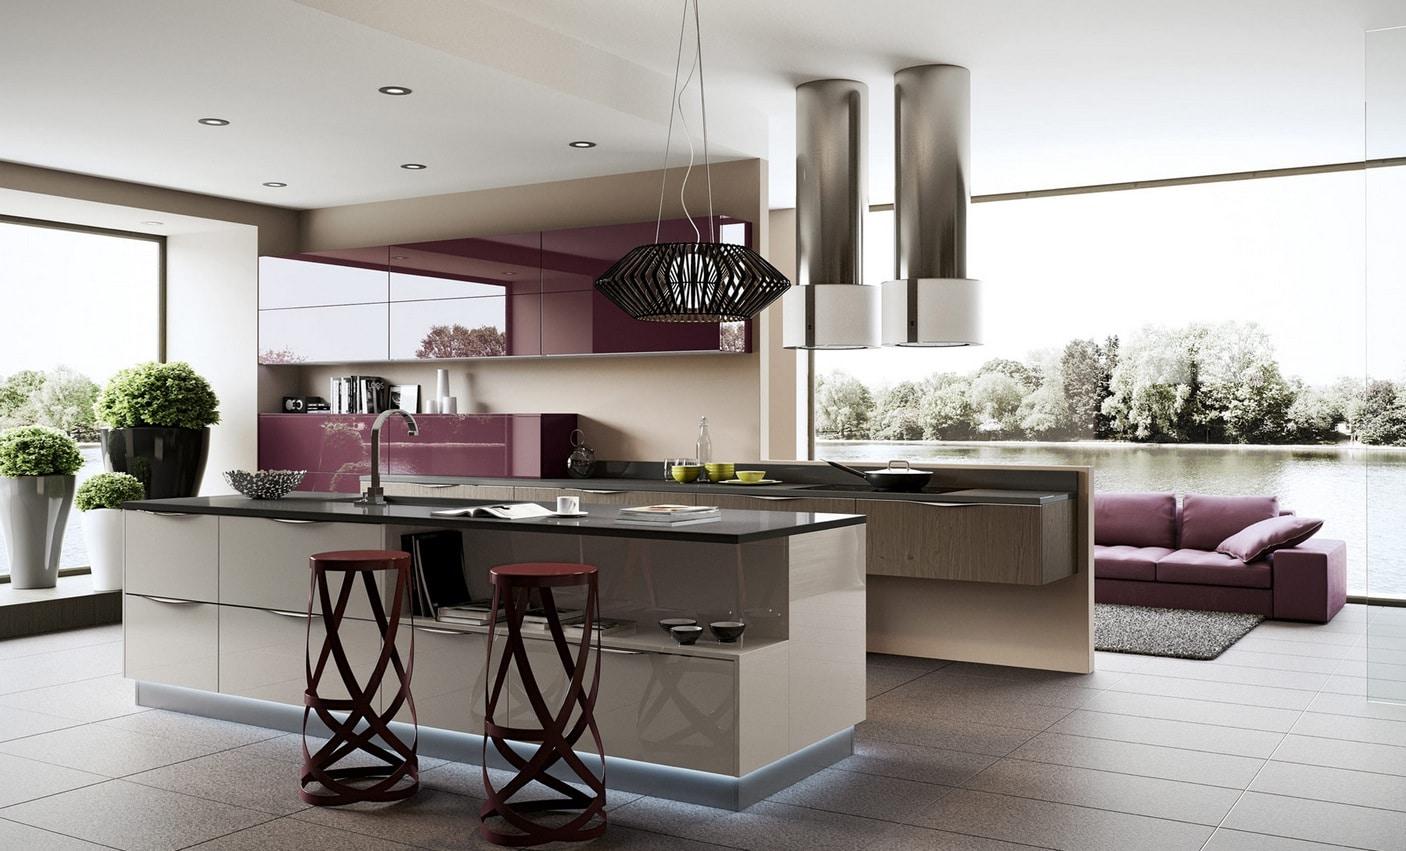 Dise o de cocinas modernas al estilo arte pop construye - Cocinas con estilo moderno ...